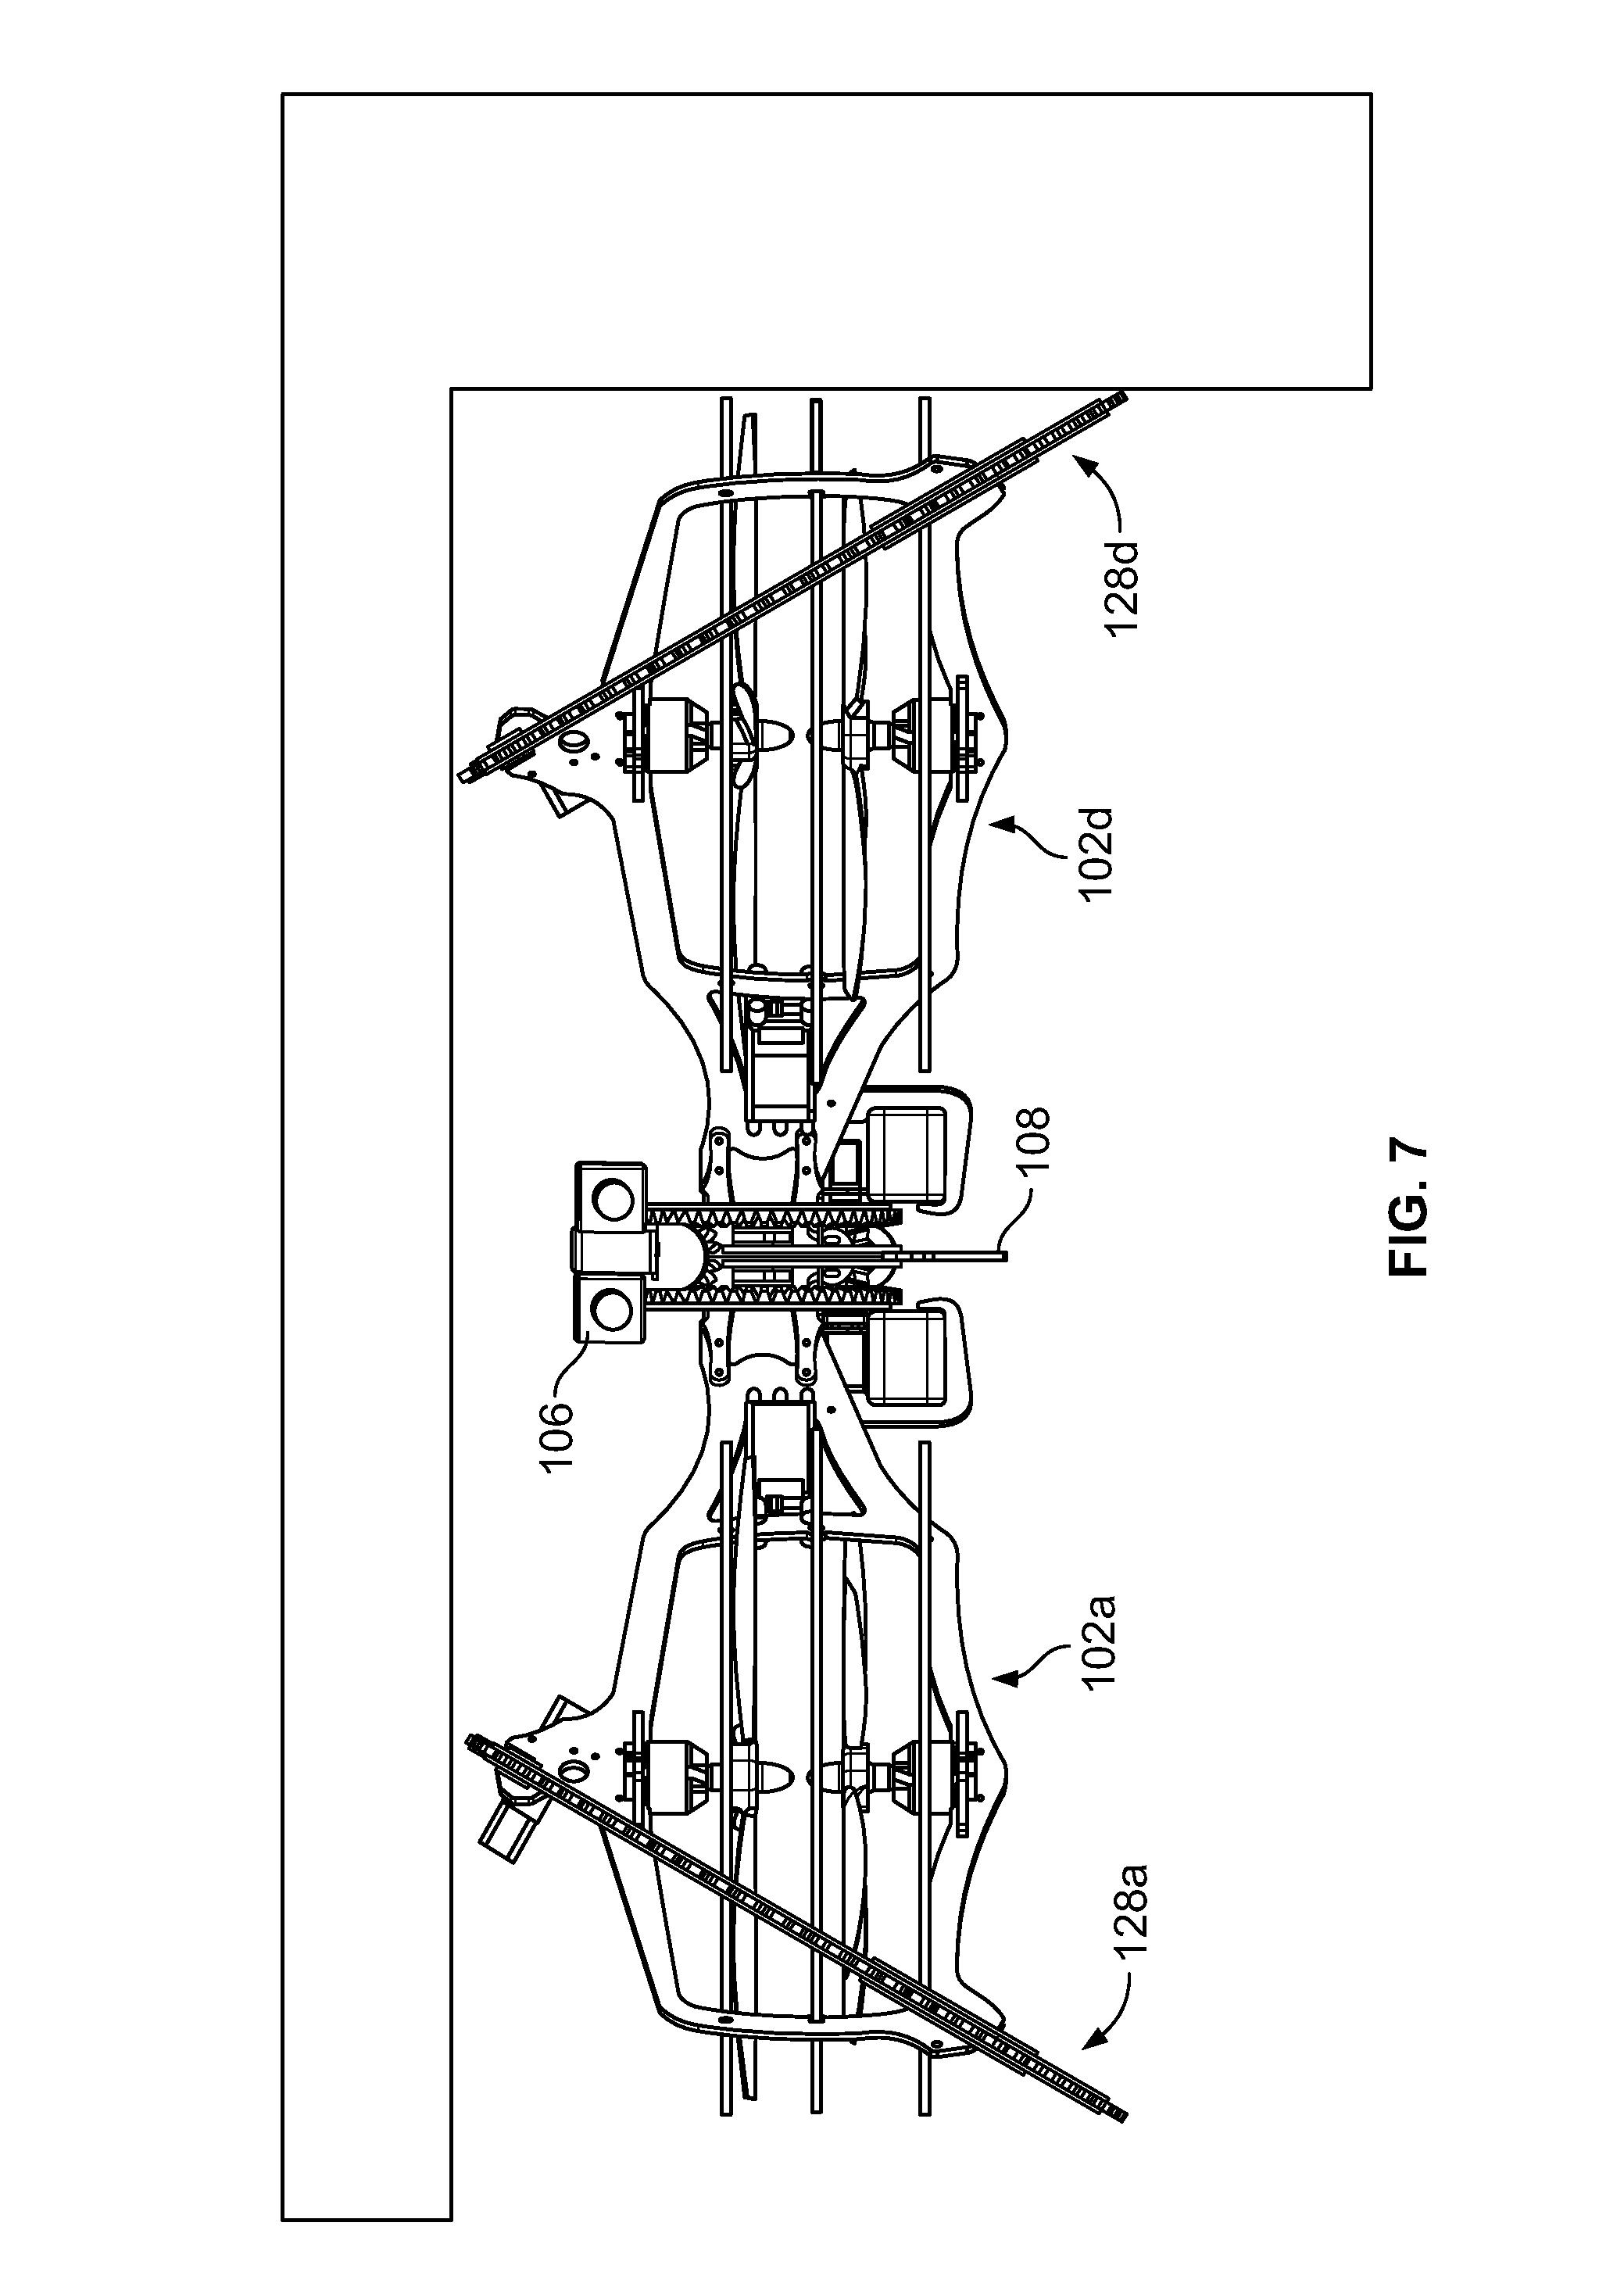 99 Kenworth T800b Wiring Diagram